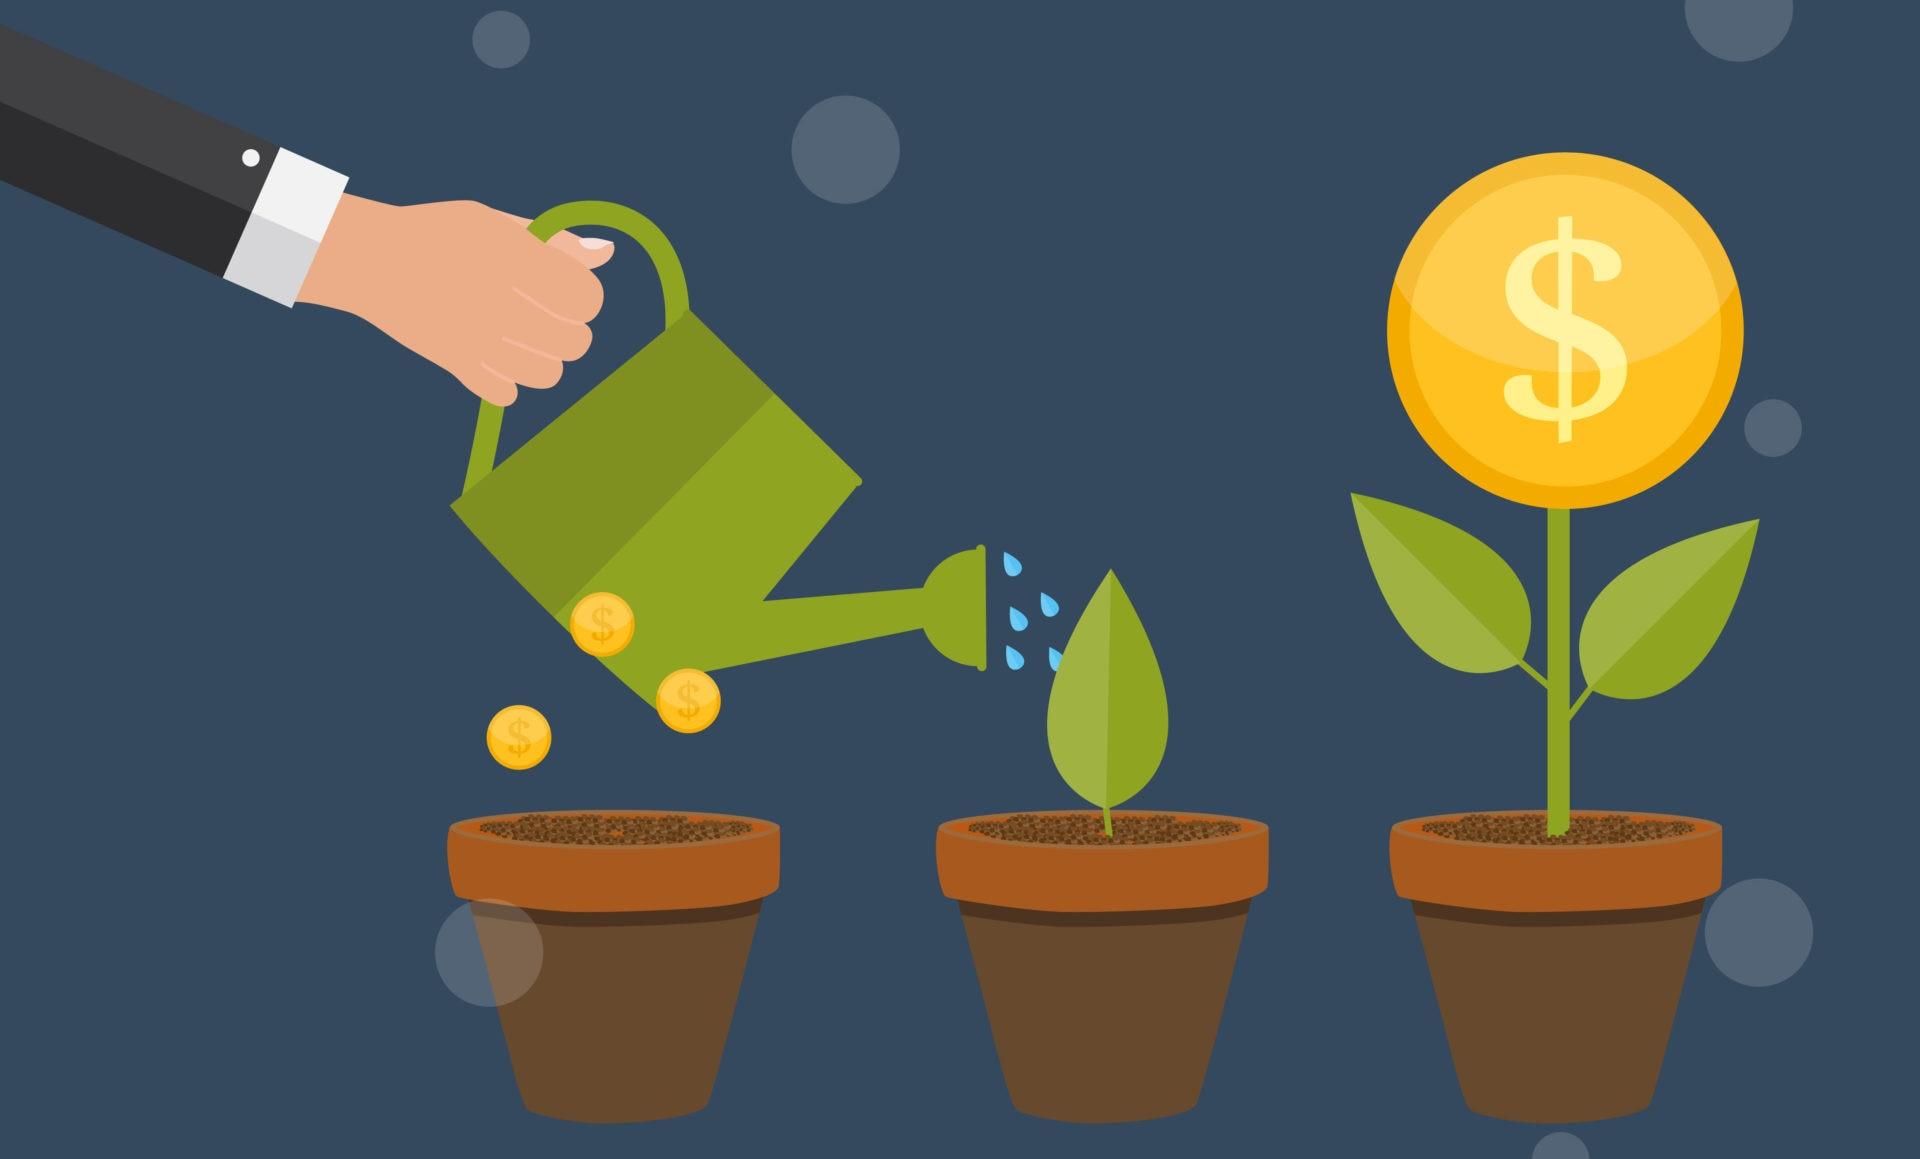 crecimiento fintech recurso dolar economía